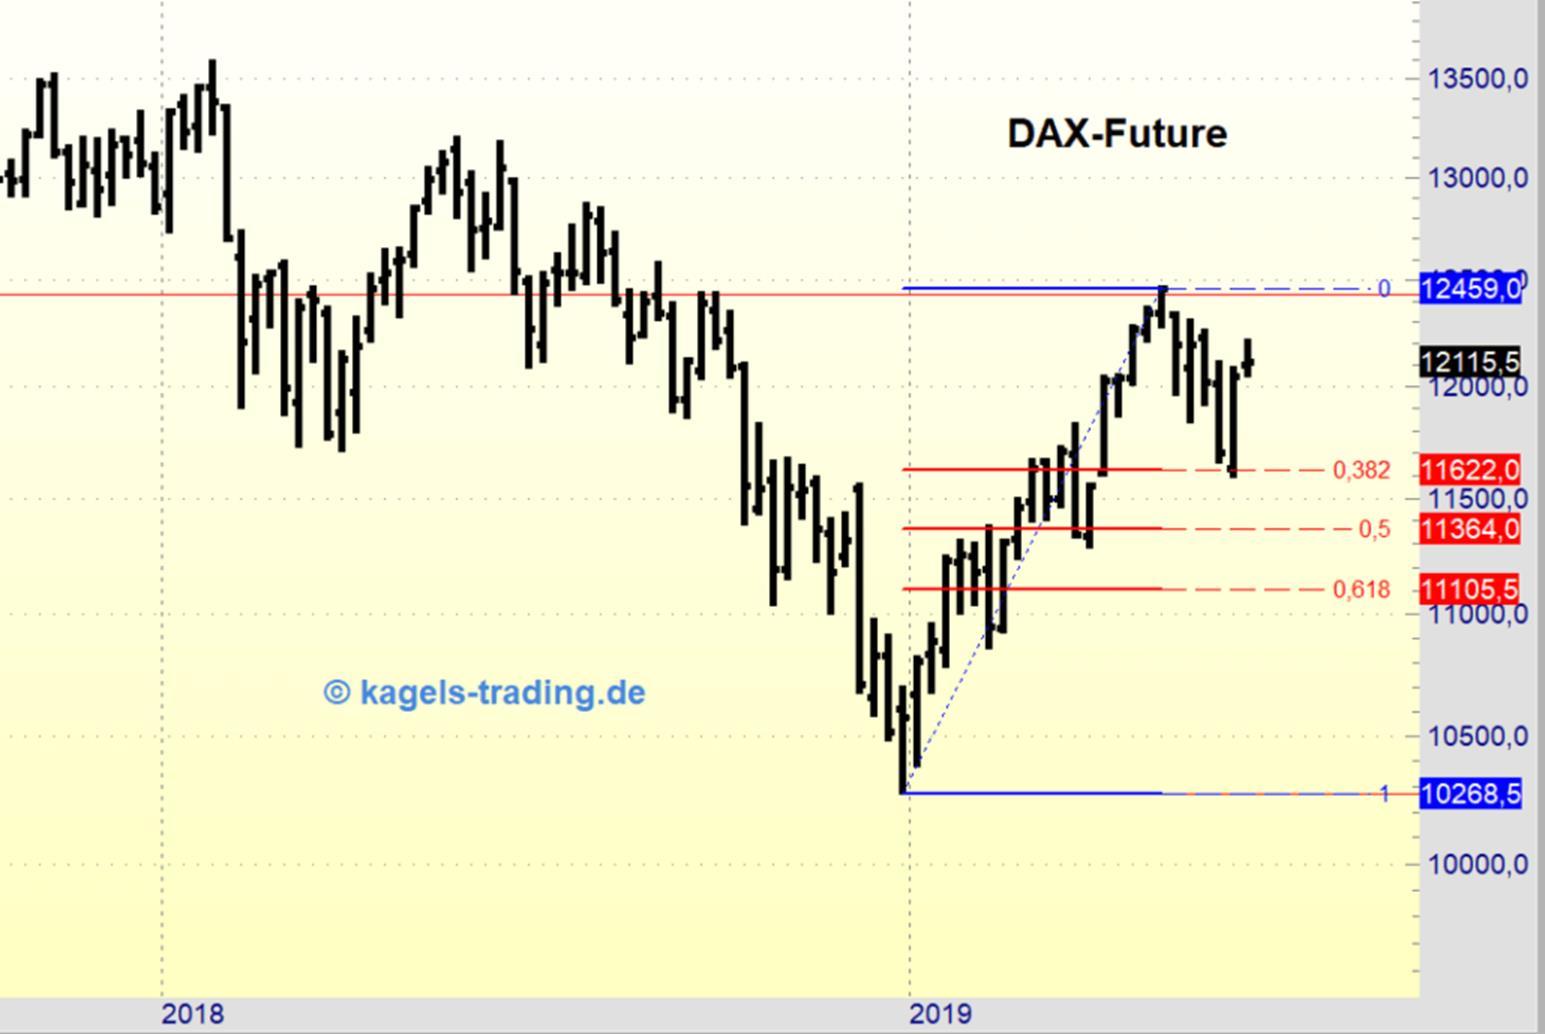 DAX-Future Chartanalyse